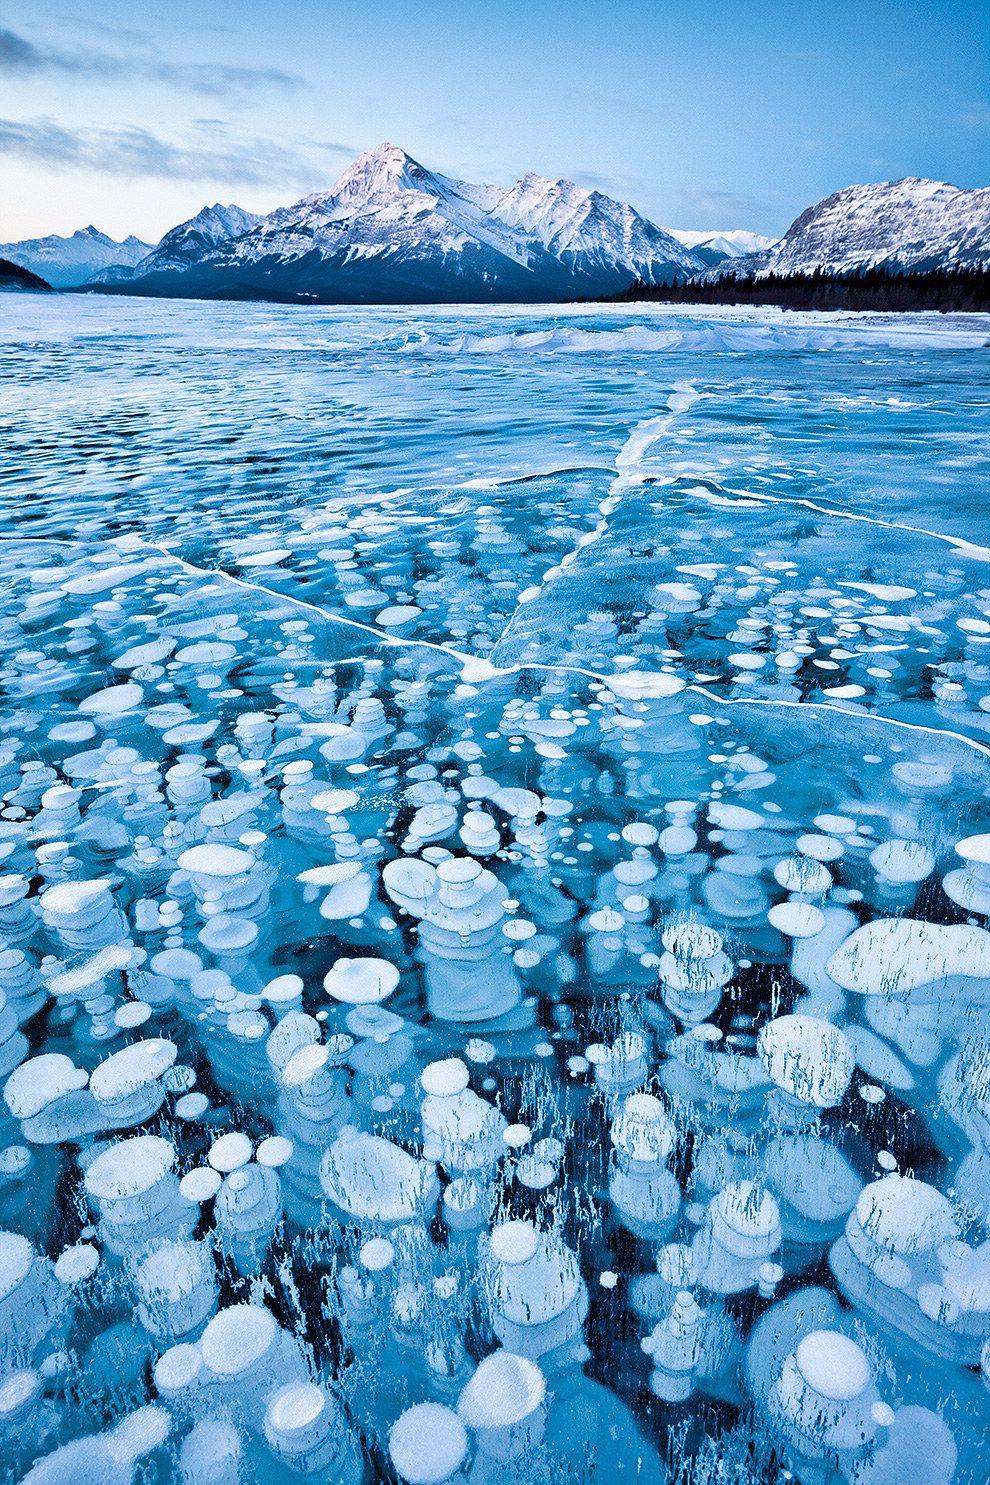 Flammable Ice Bubbles Frozen Bubbles Of Methane Trapped Beneath Alberta S Lake Abraham Frozen Bubbles Abraham Lake Natural Phenomena